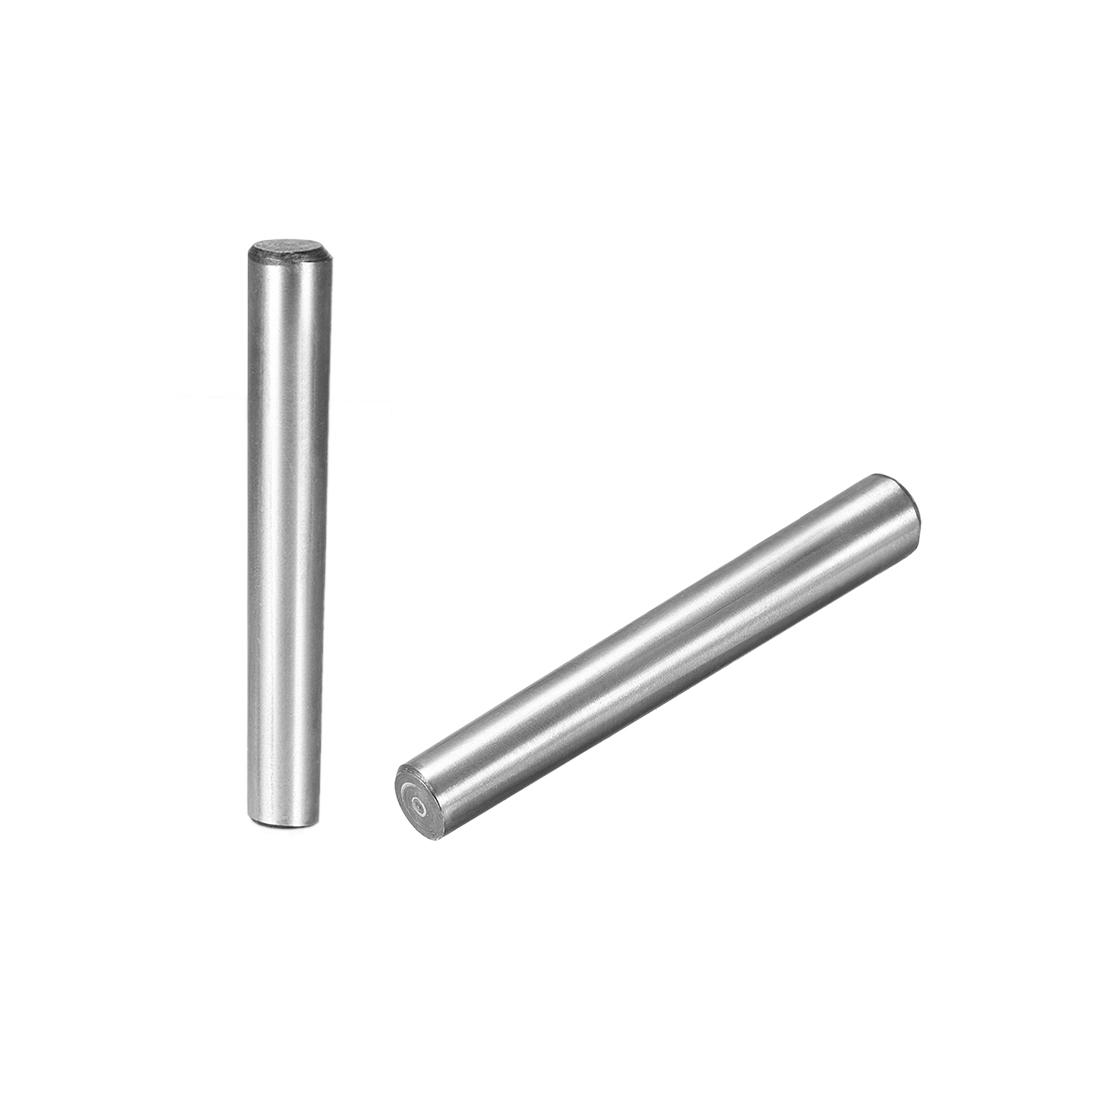 Carbon Steel GB117 80mm Length 10mm x 11.6mm Small End Diameter 1:50 Taper Pin